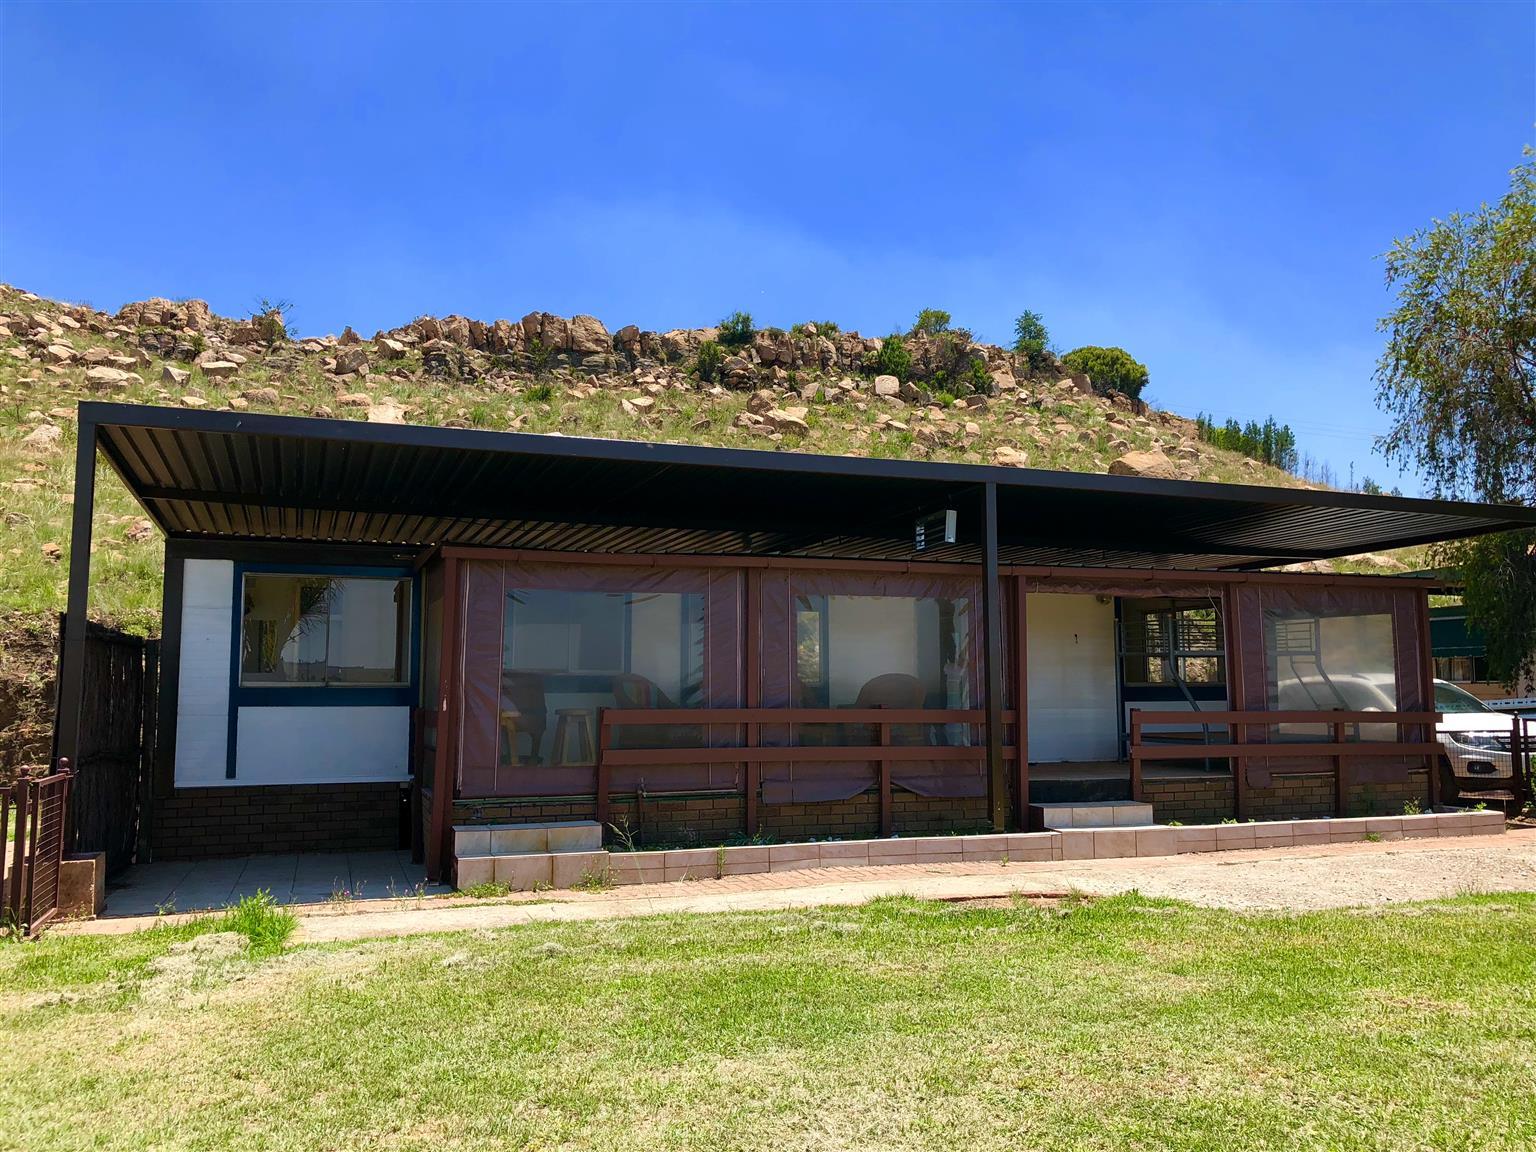 Holiday home at Bonamanzi holiday resort for sale with majestic views over Bronkhorstspru